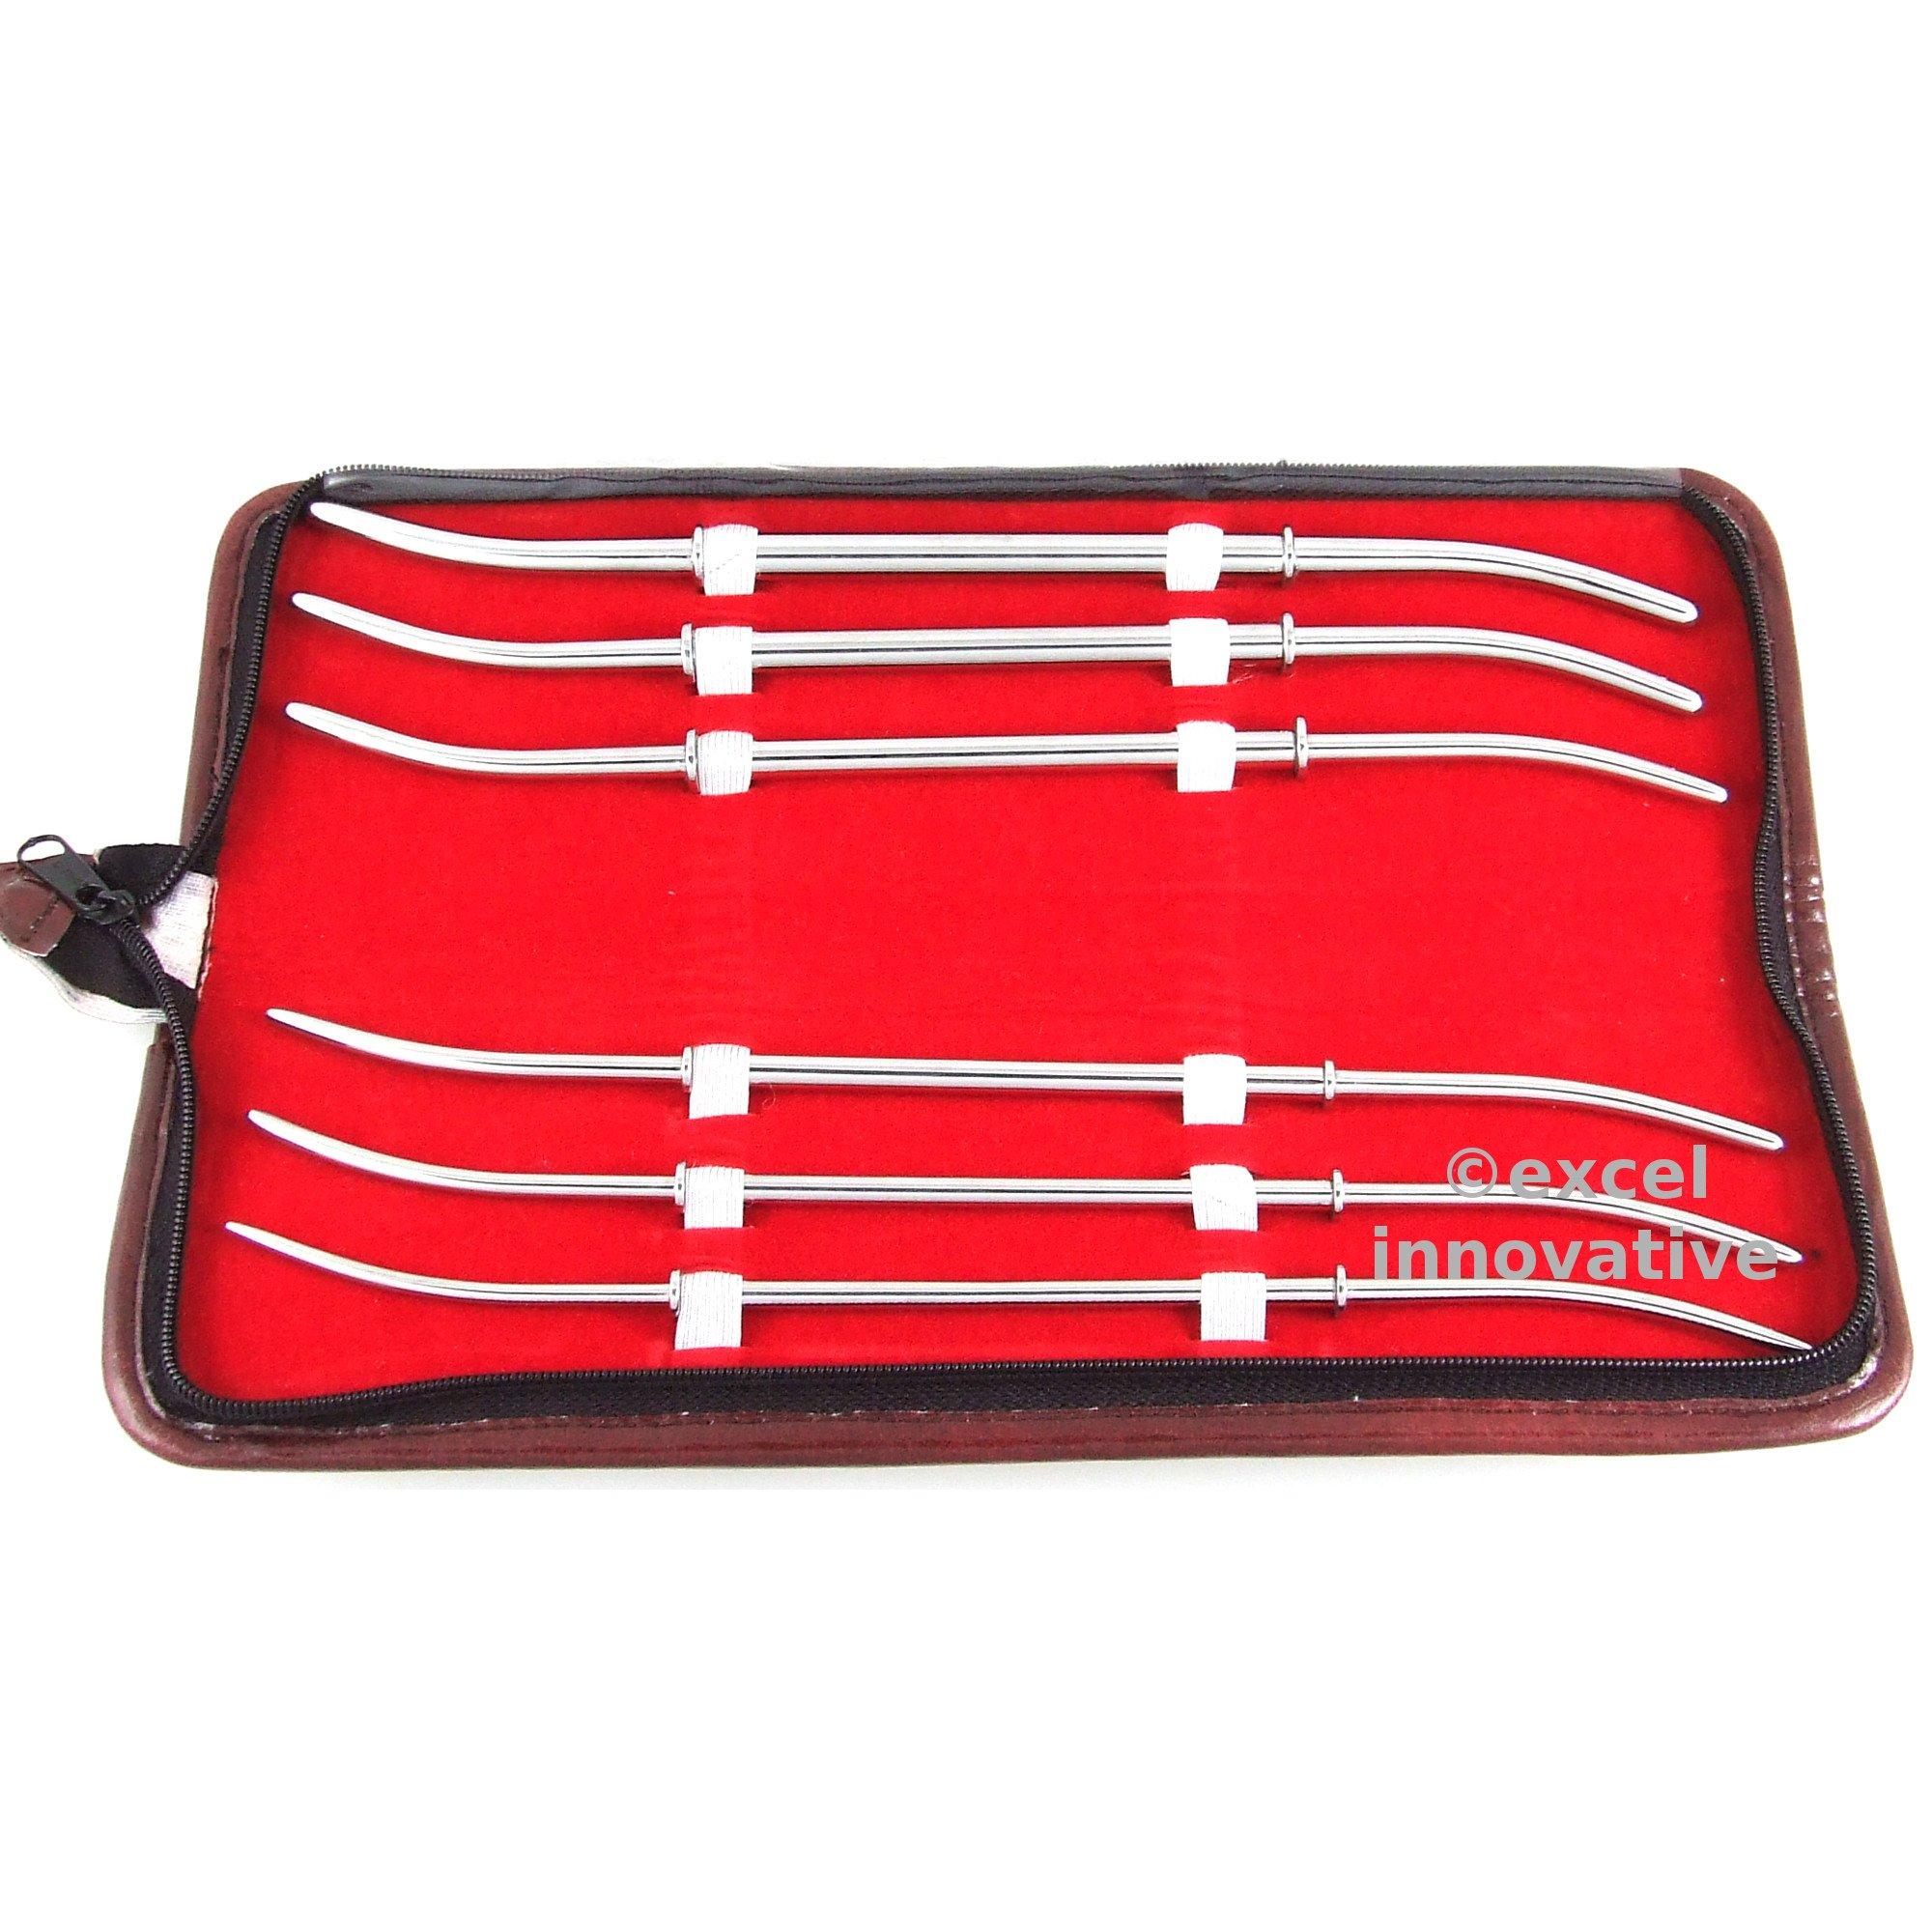 Hank Uterine Dilators Double End Set of 6 with Carrying Case/Roll   Medixplus